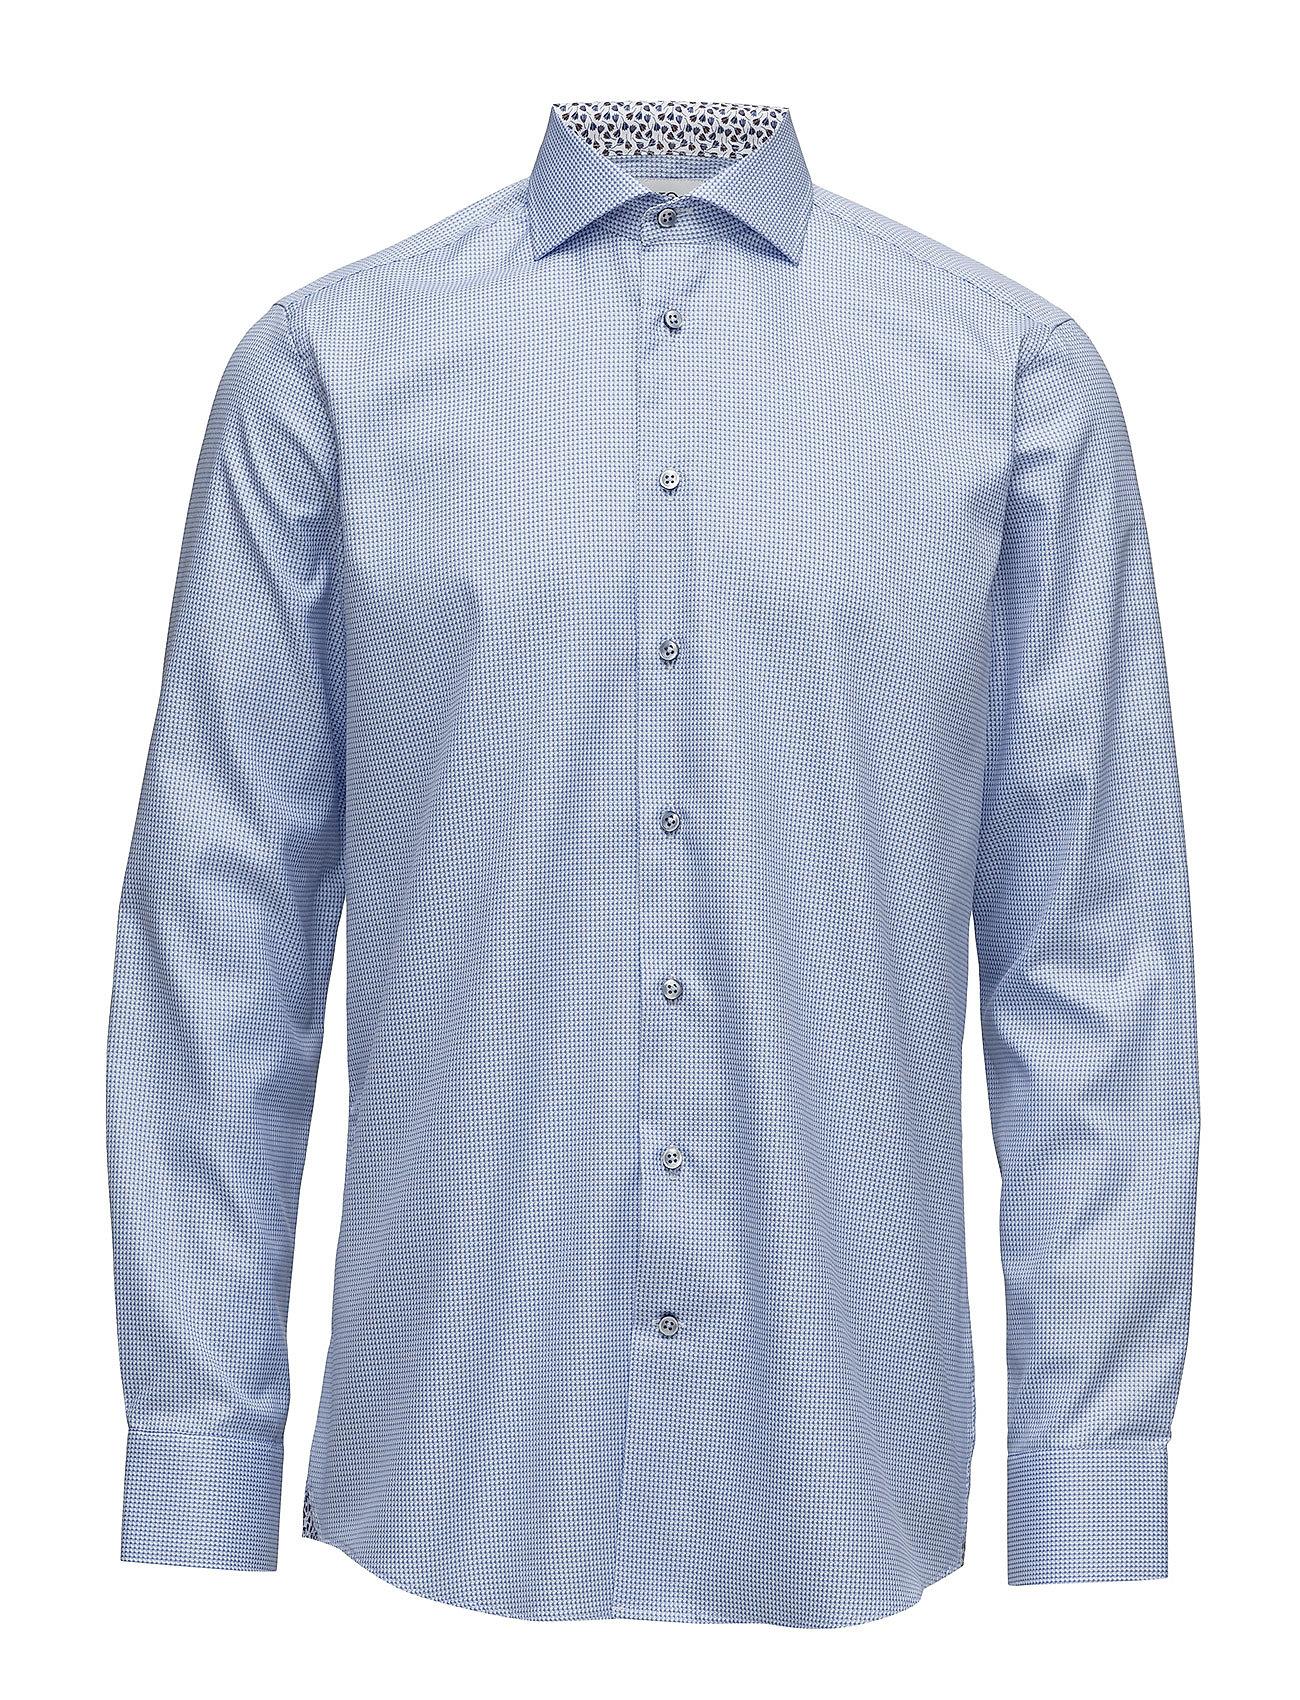 xo shirtmaker 8827 details - gordon fc på boozt.com dk